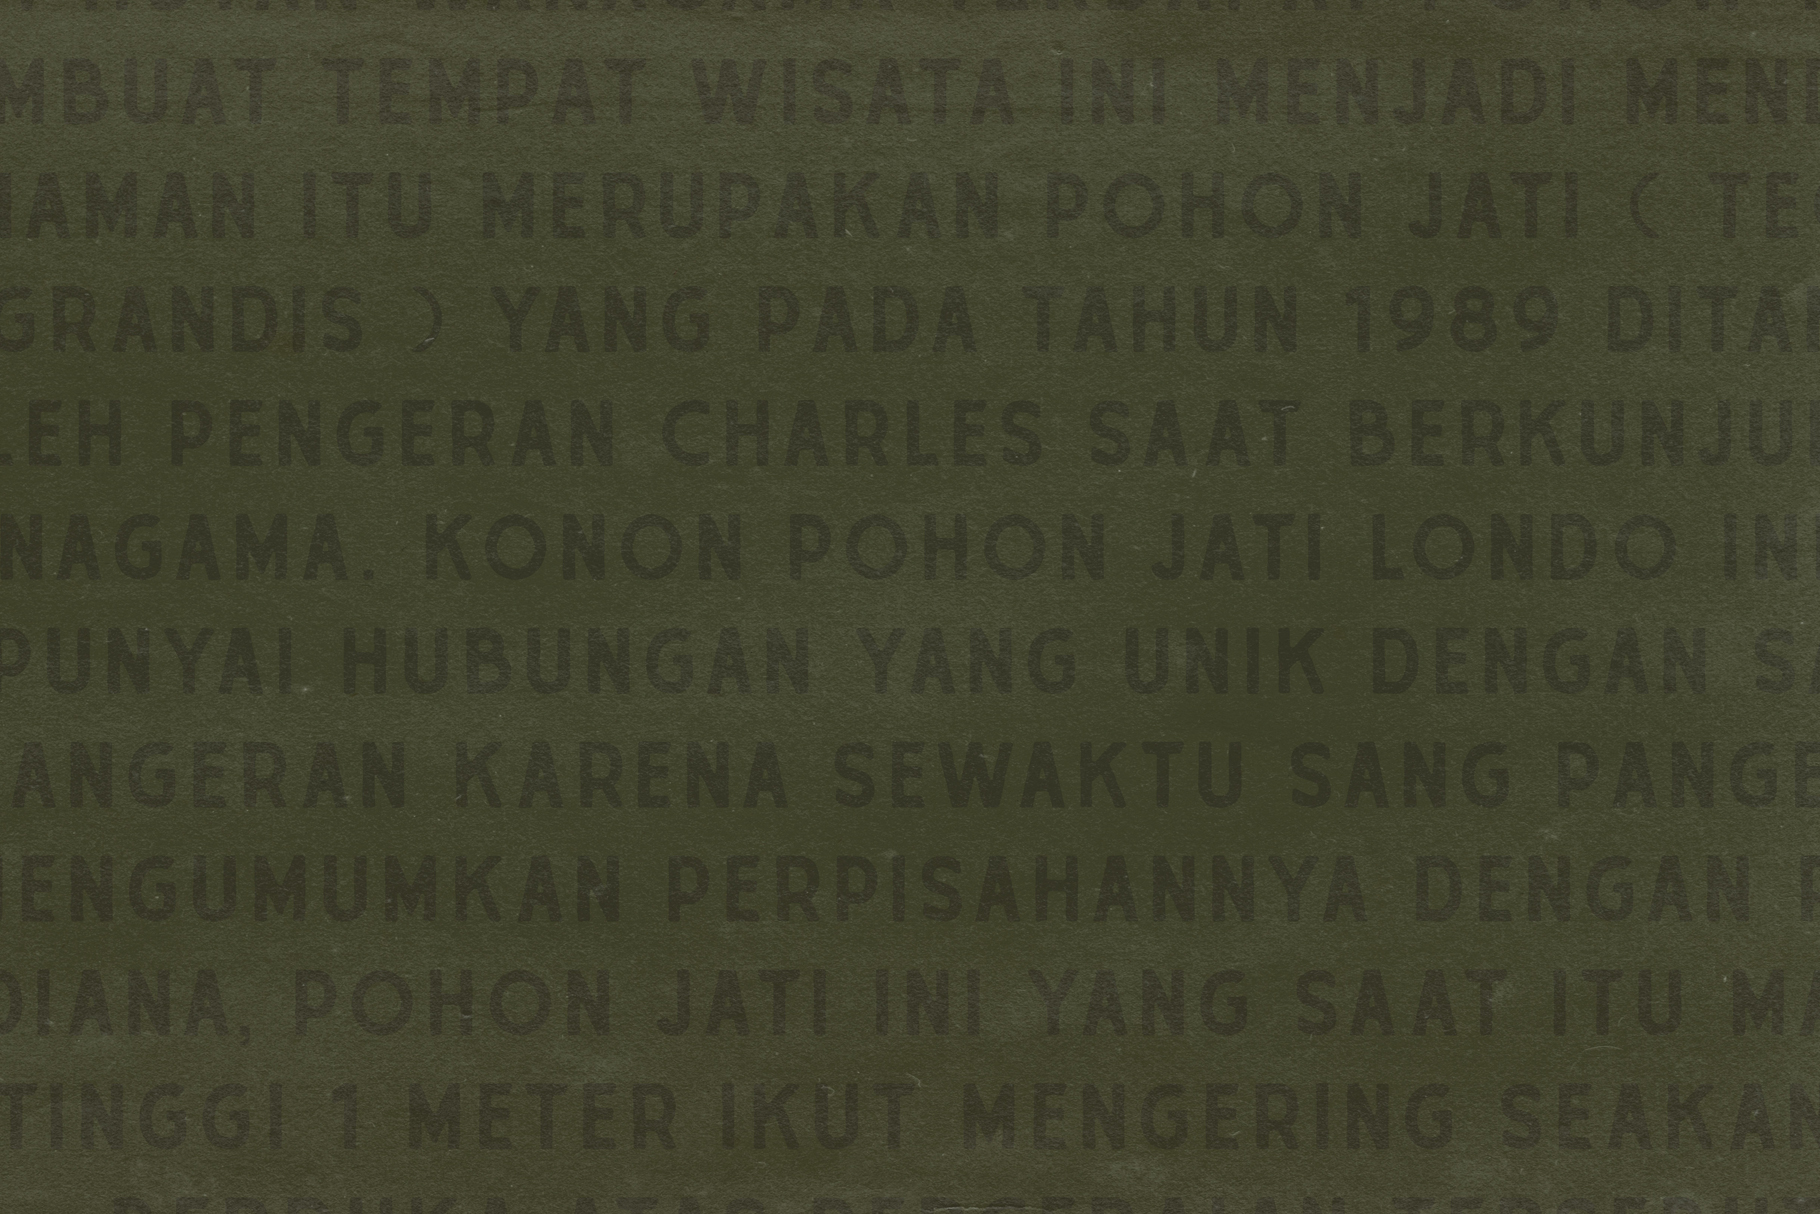 Suhanto Handdrawn Typeface example image 2